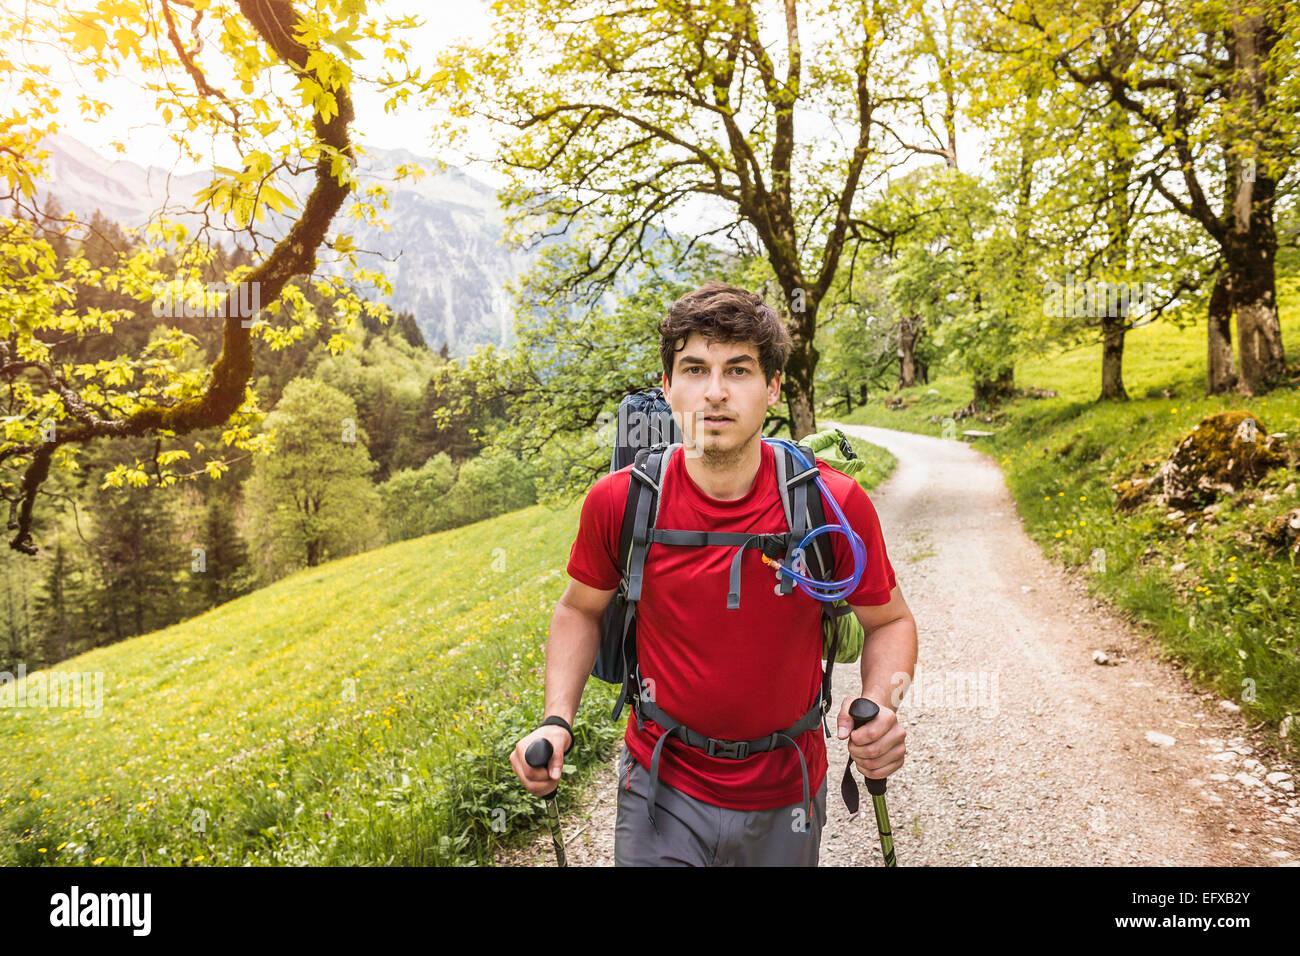 Young man hiking up rural road, Oberstdorf, Bavaria, Germany - Stock Image